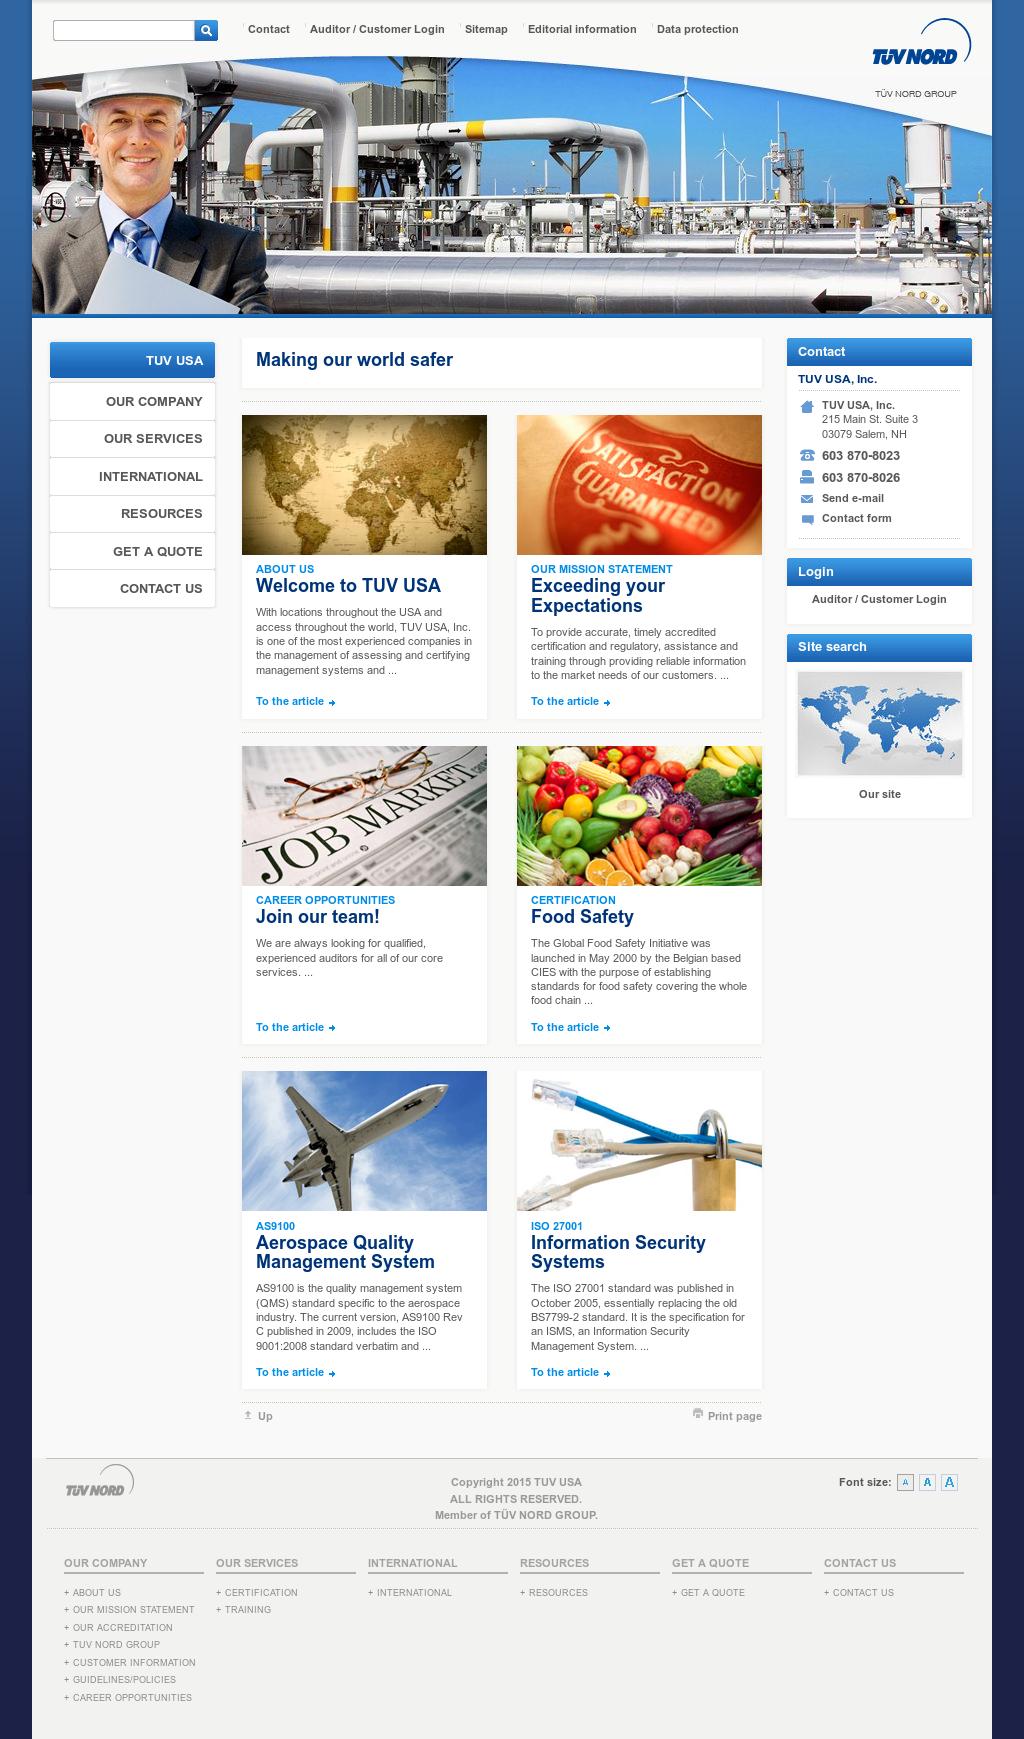 TUV USA Competitors, Revenue and Employees - Owler Company Profile